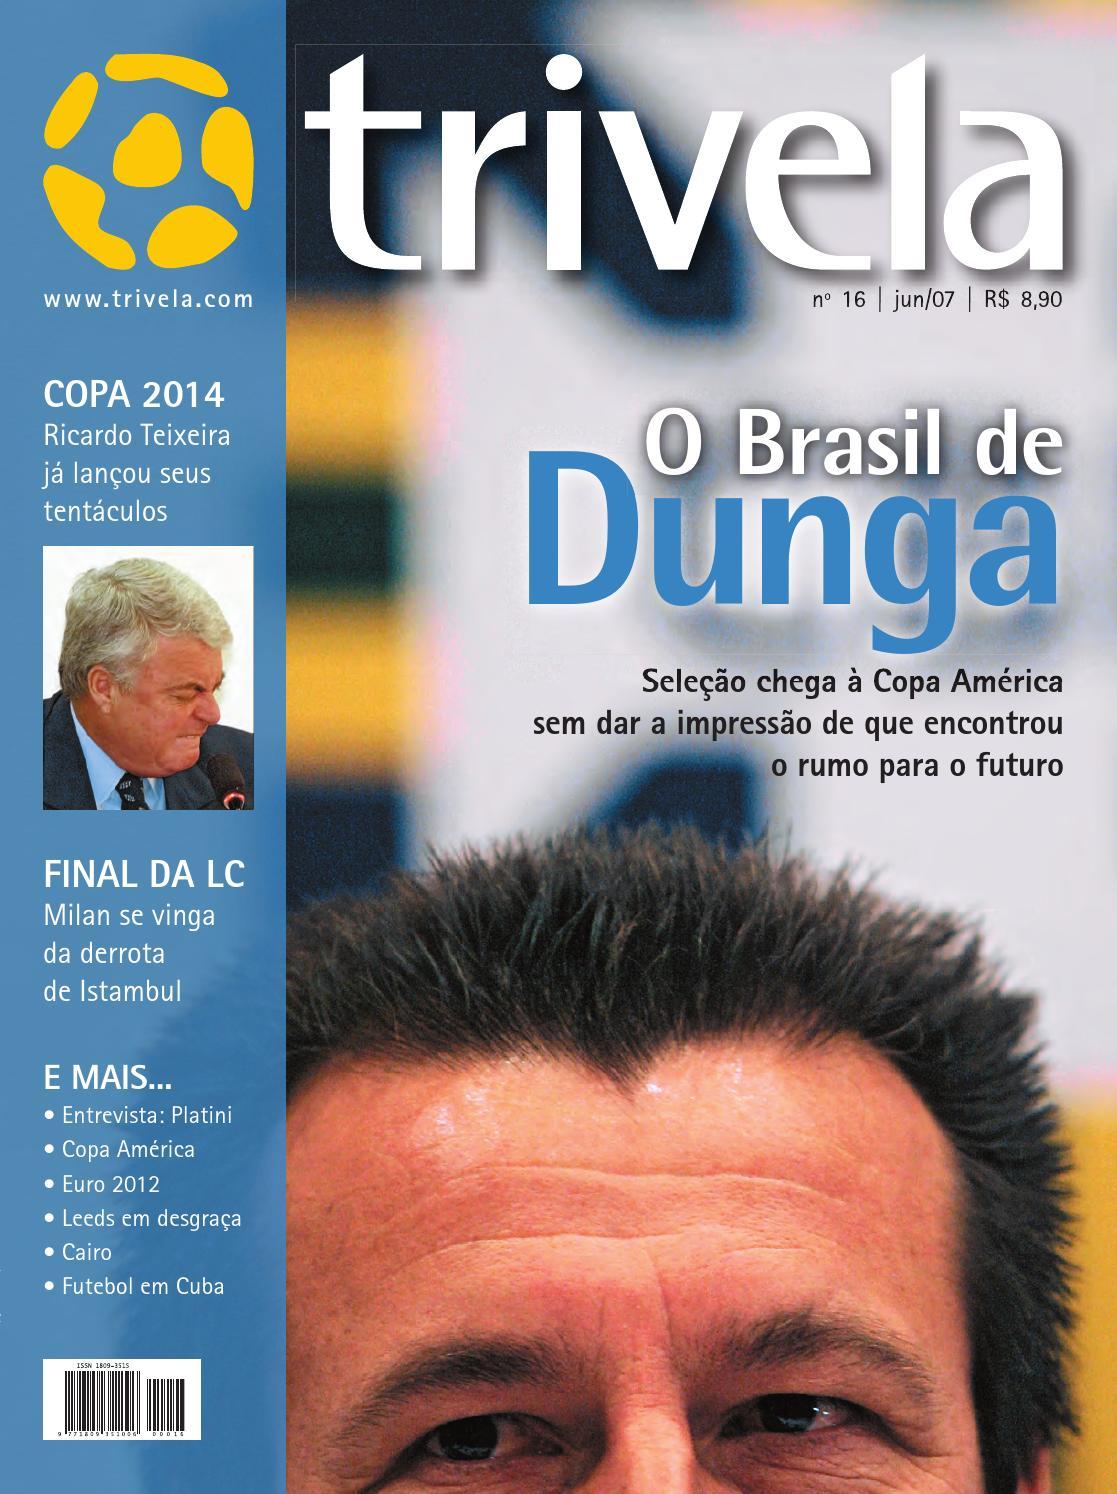 Trivela 16 (jun 07) by °F451 - issuu 966cc48941dcc